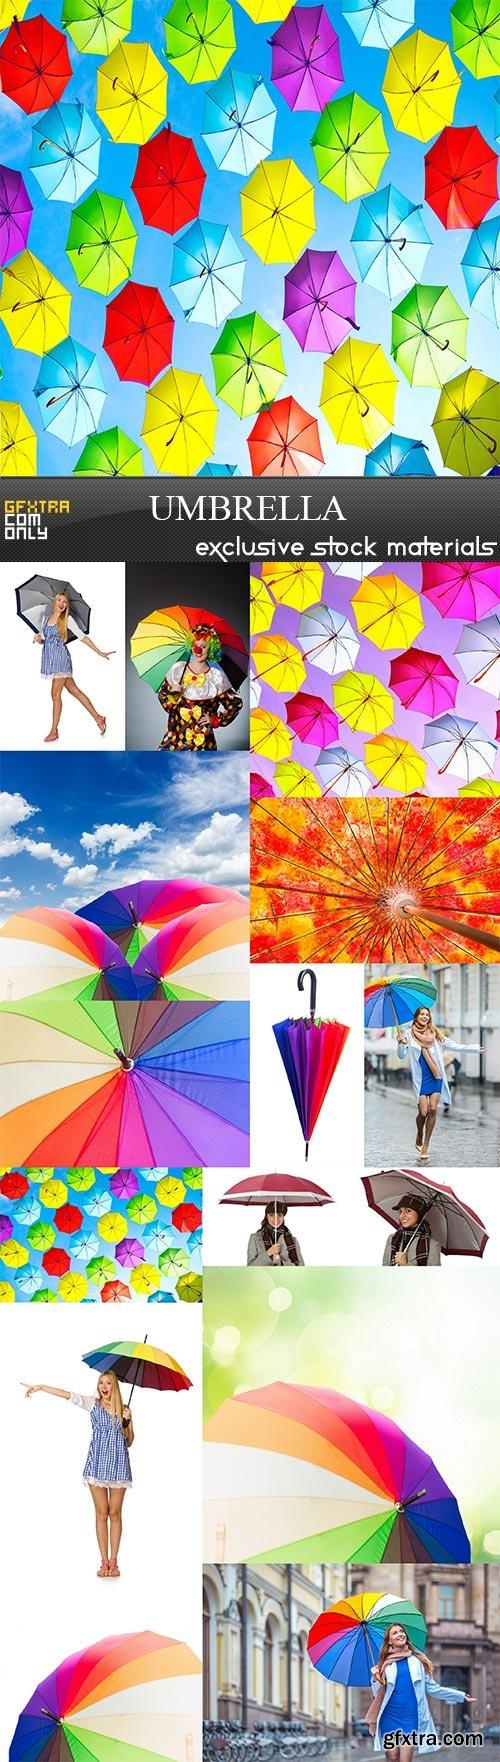 Umbrella, 15 x UHQ JPEG